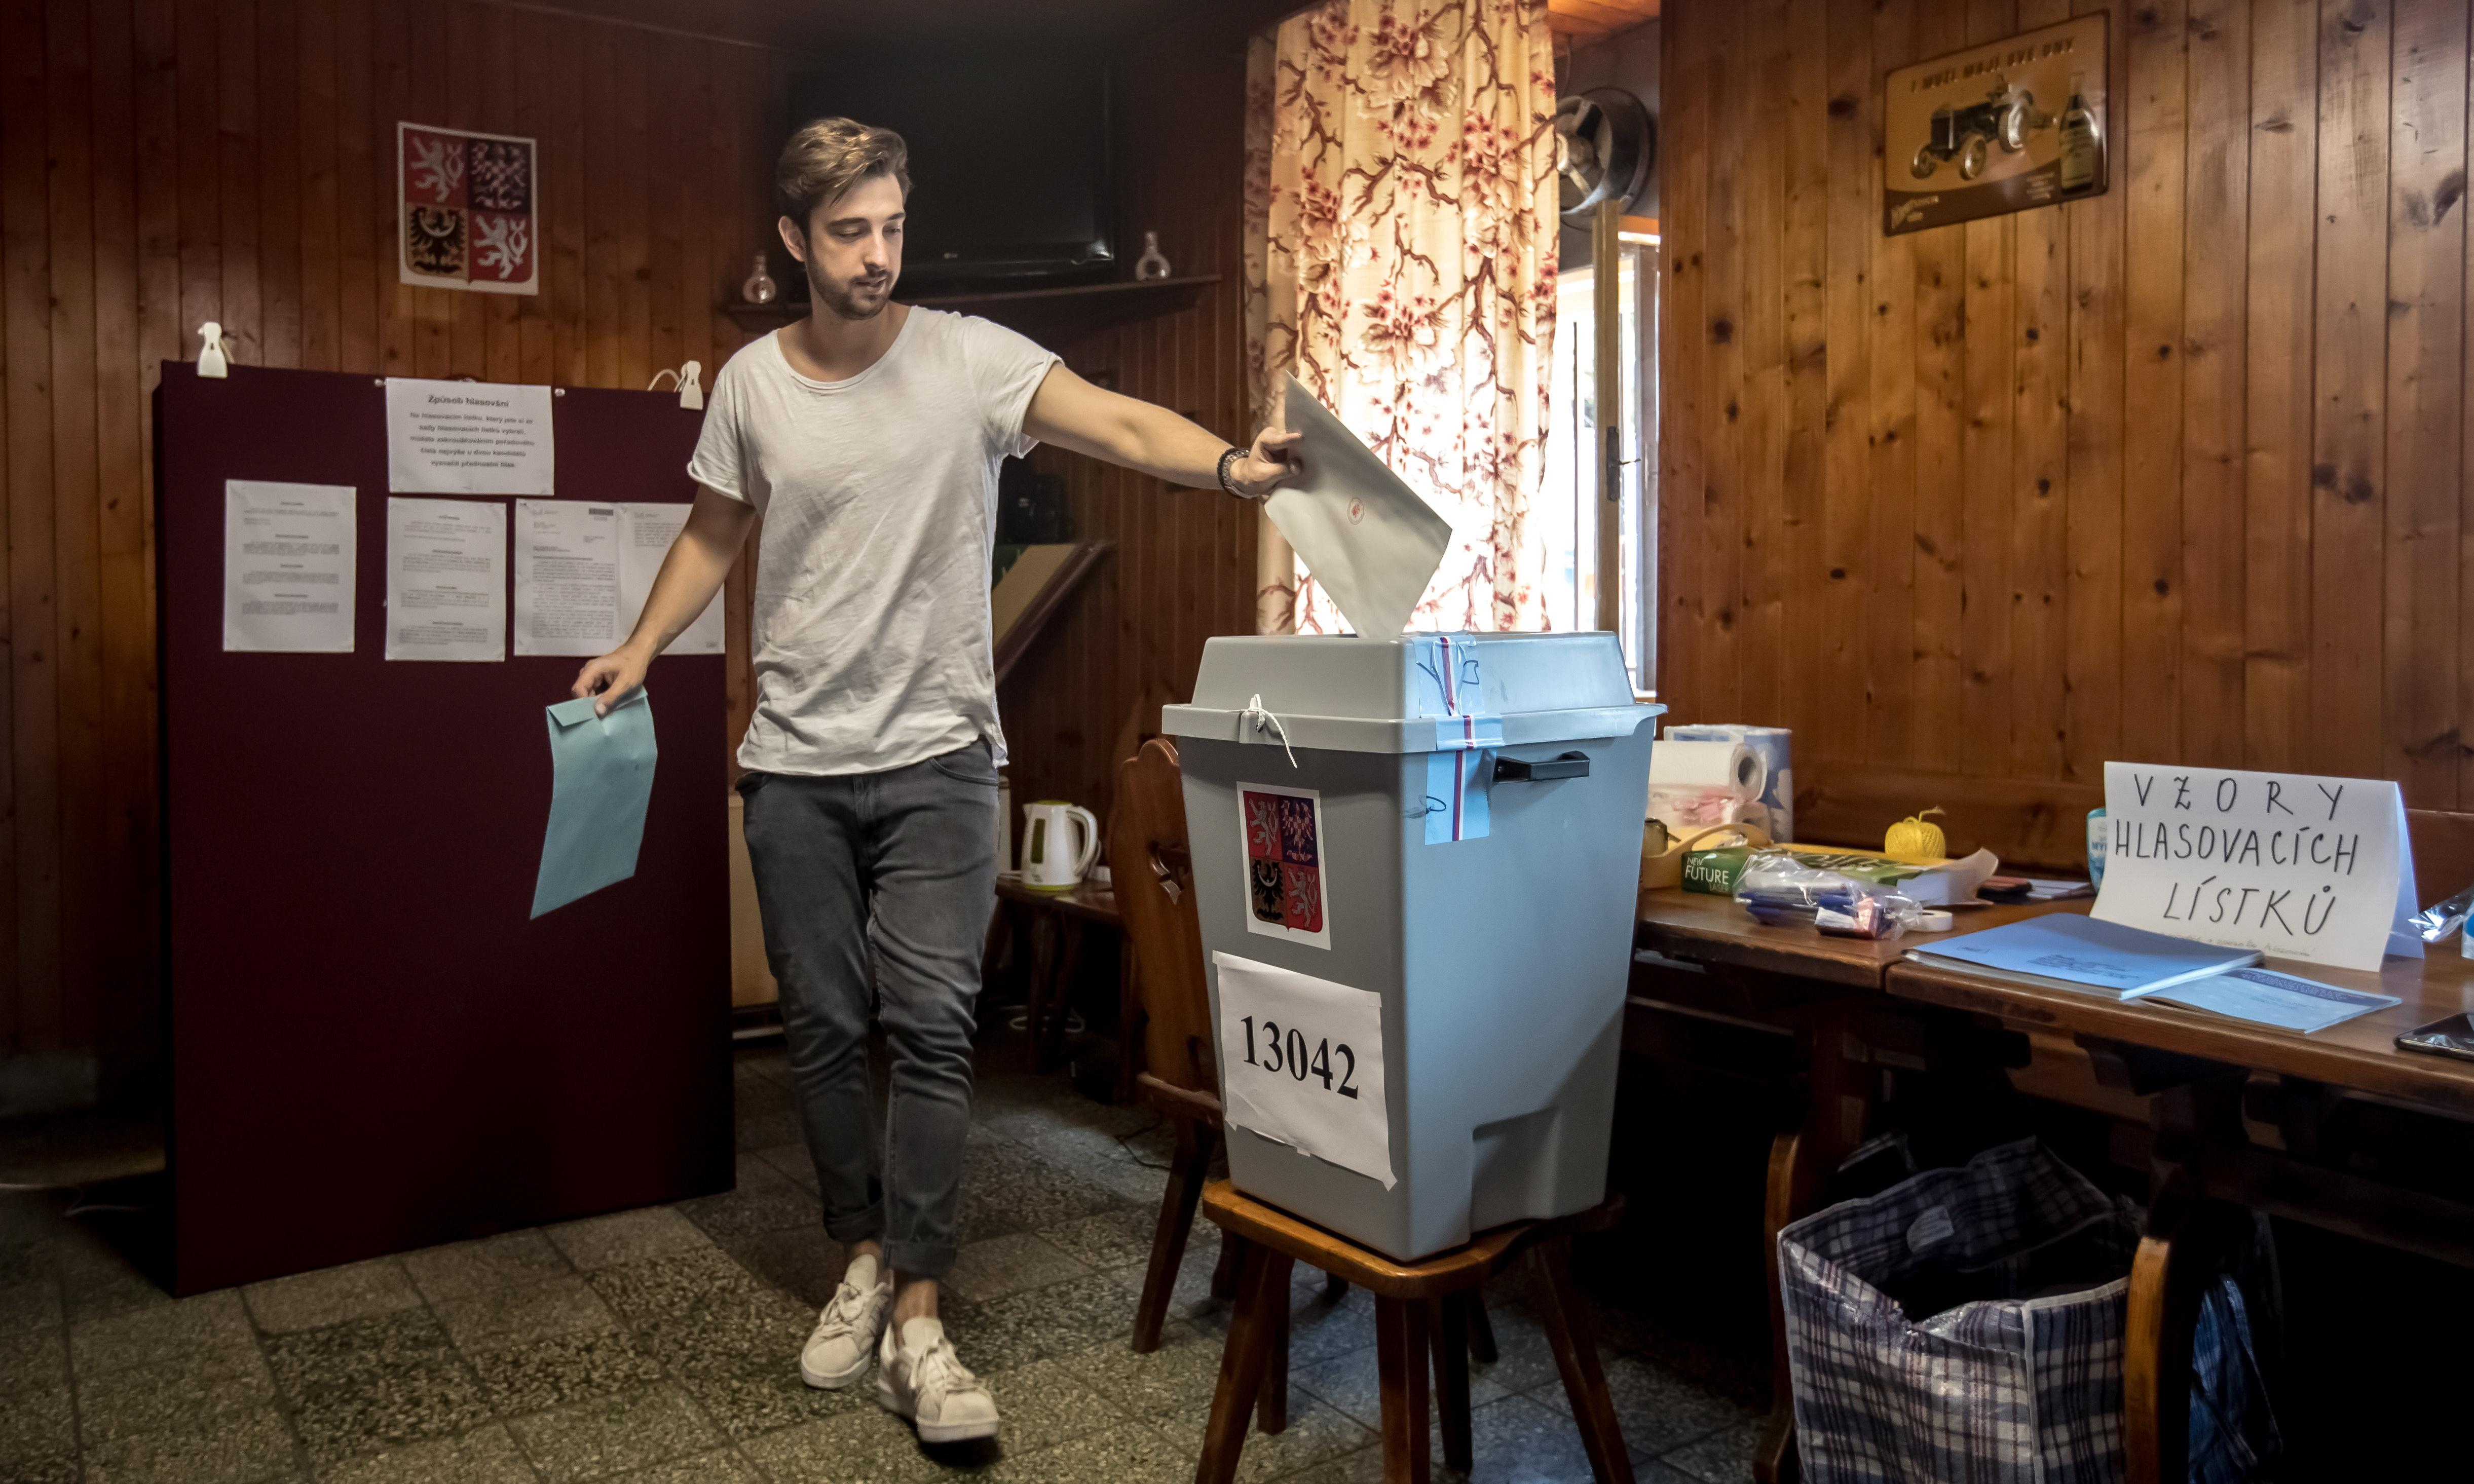 European elections: final votes cast as EU awaits results